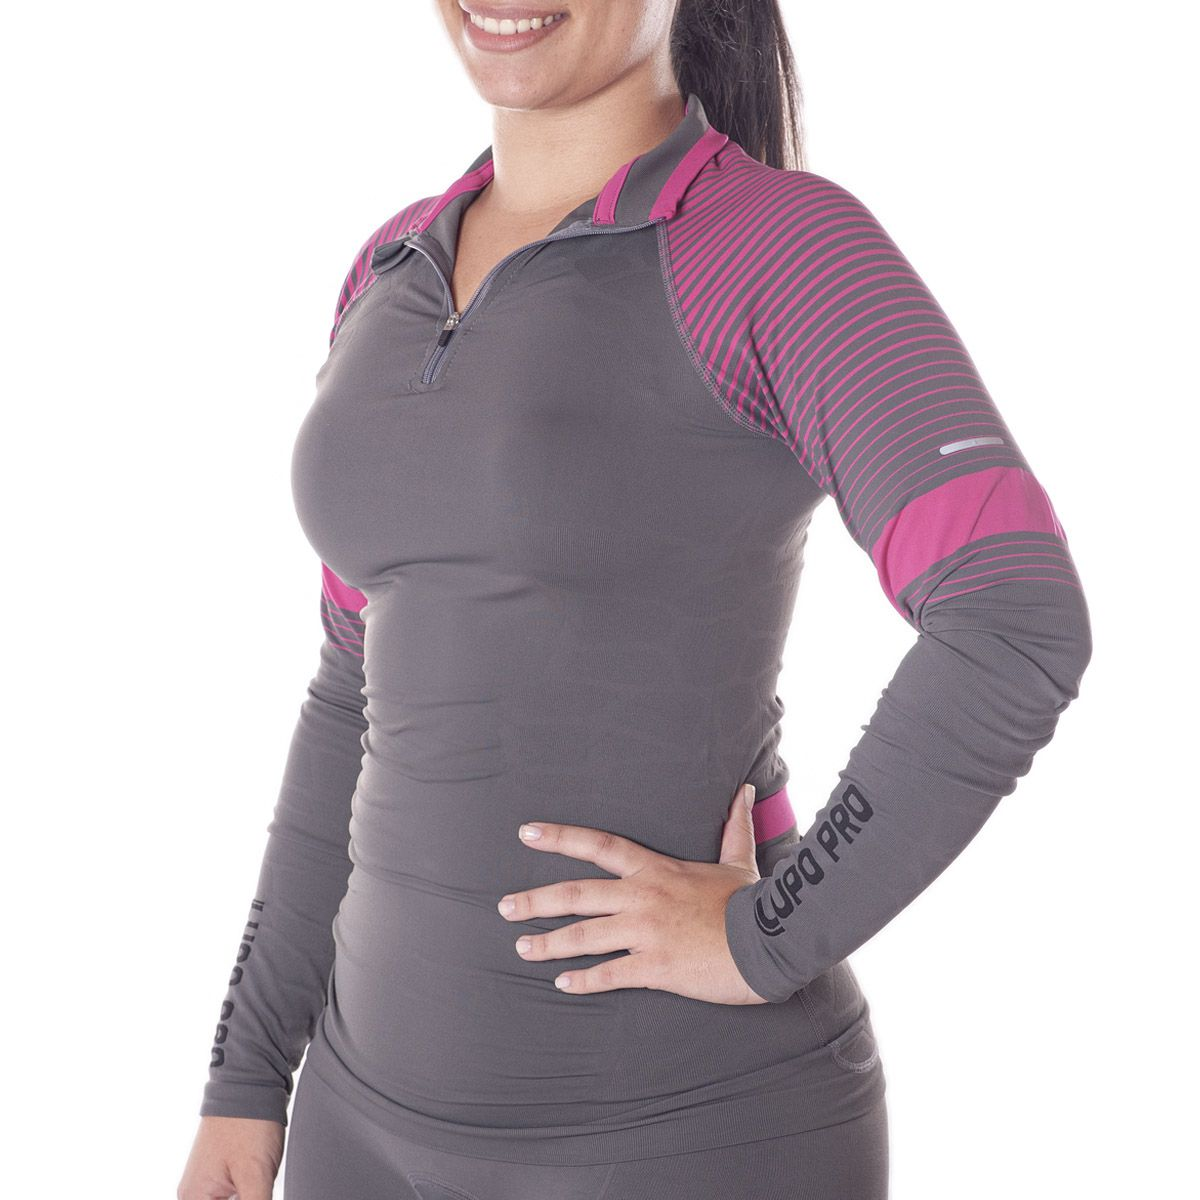 Camiseta para ciclismo manga longa feminina Lupo .